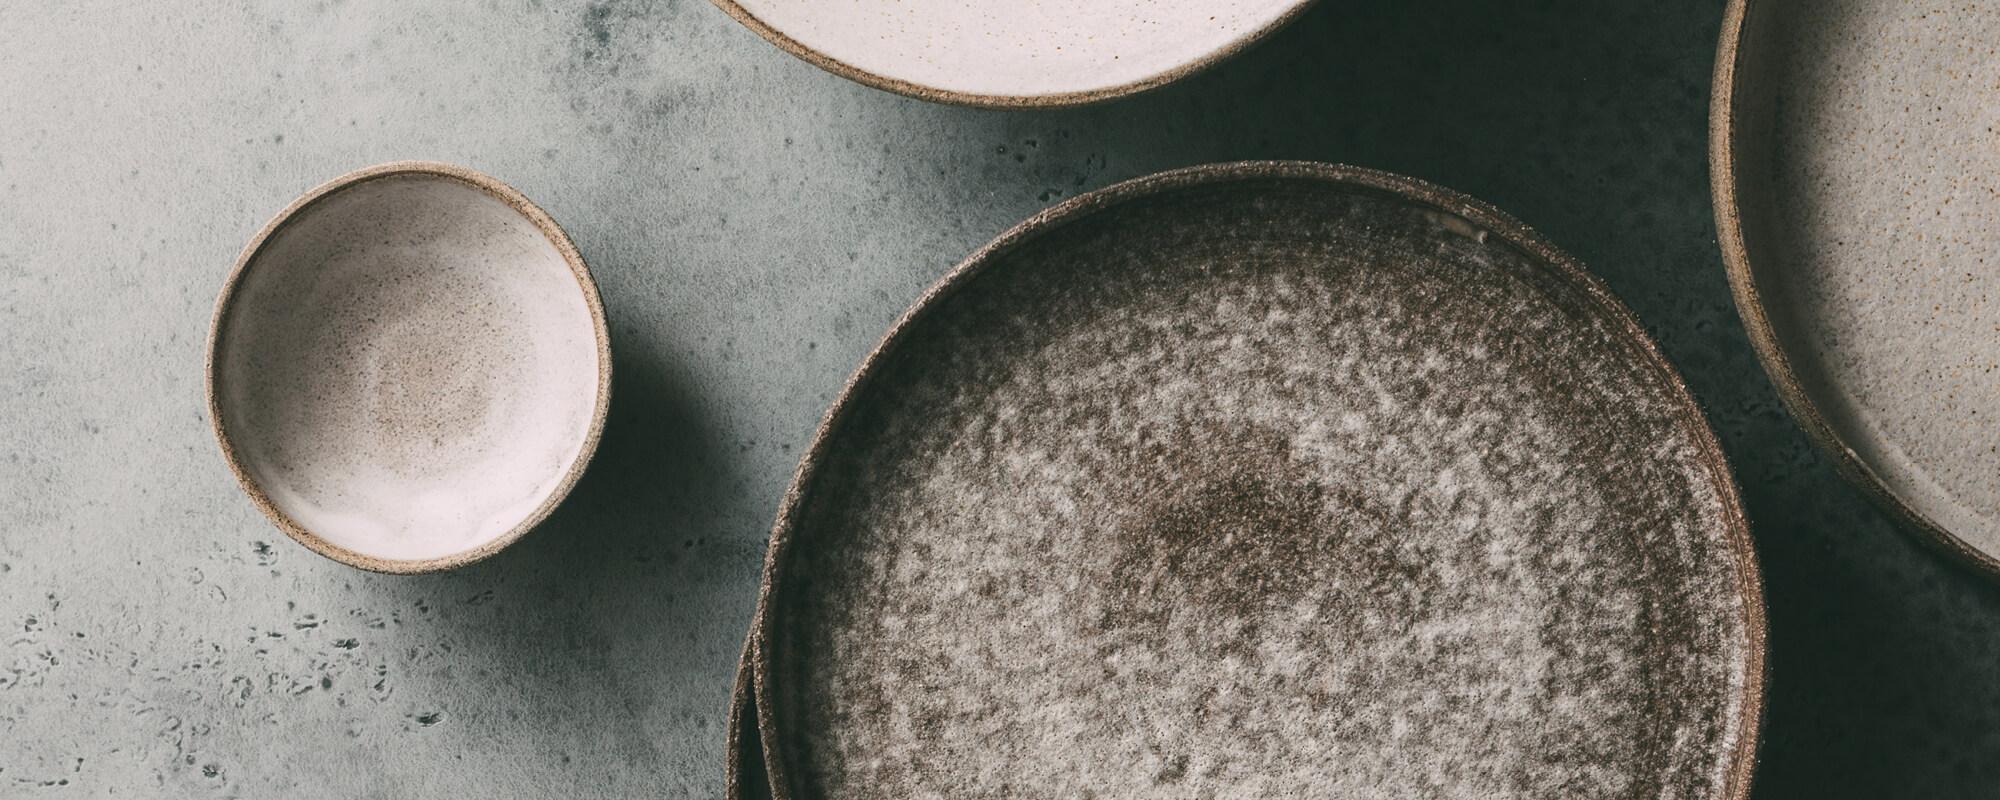 Keramik Schüsseln